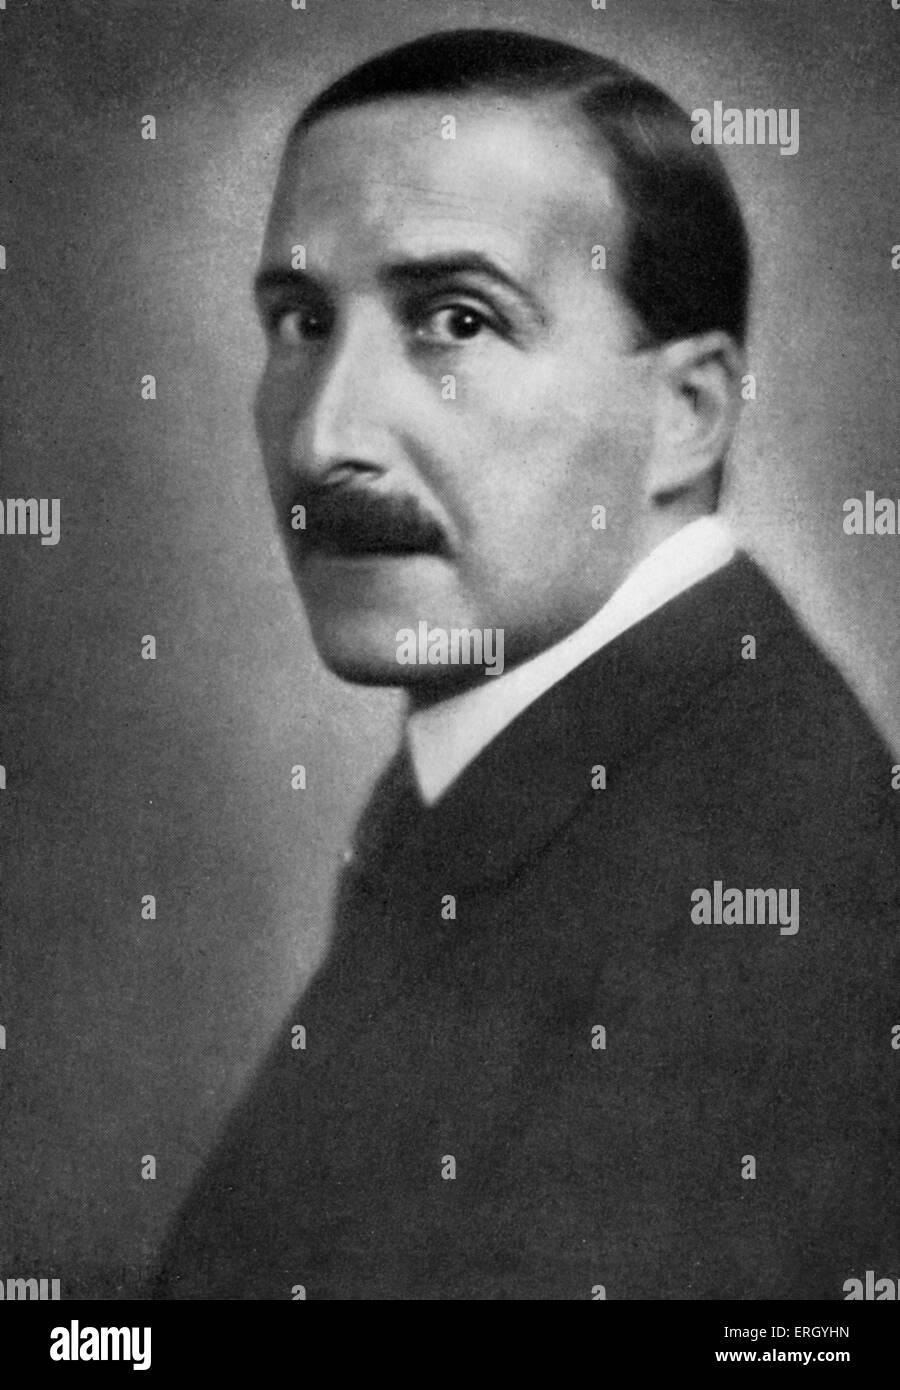 Stefan Zweig in 1940. Austrian novelist, playwright, journalist and biographer. 28 November 1881 - 22 February 1942. - Stock Image